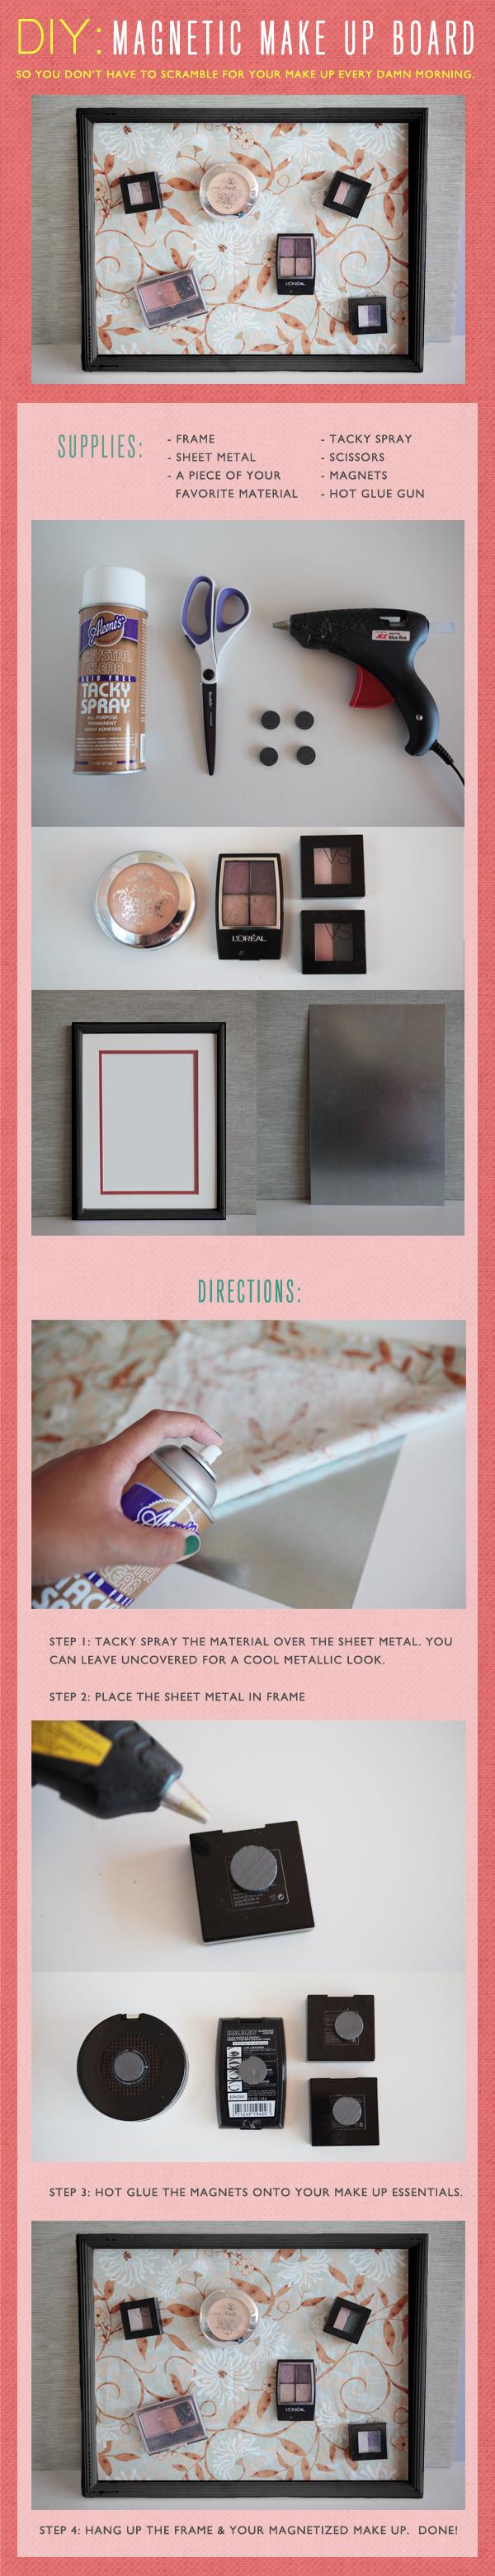 DIY: Magentic Make Up Board